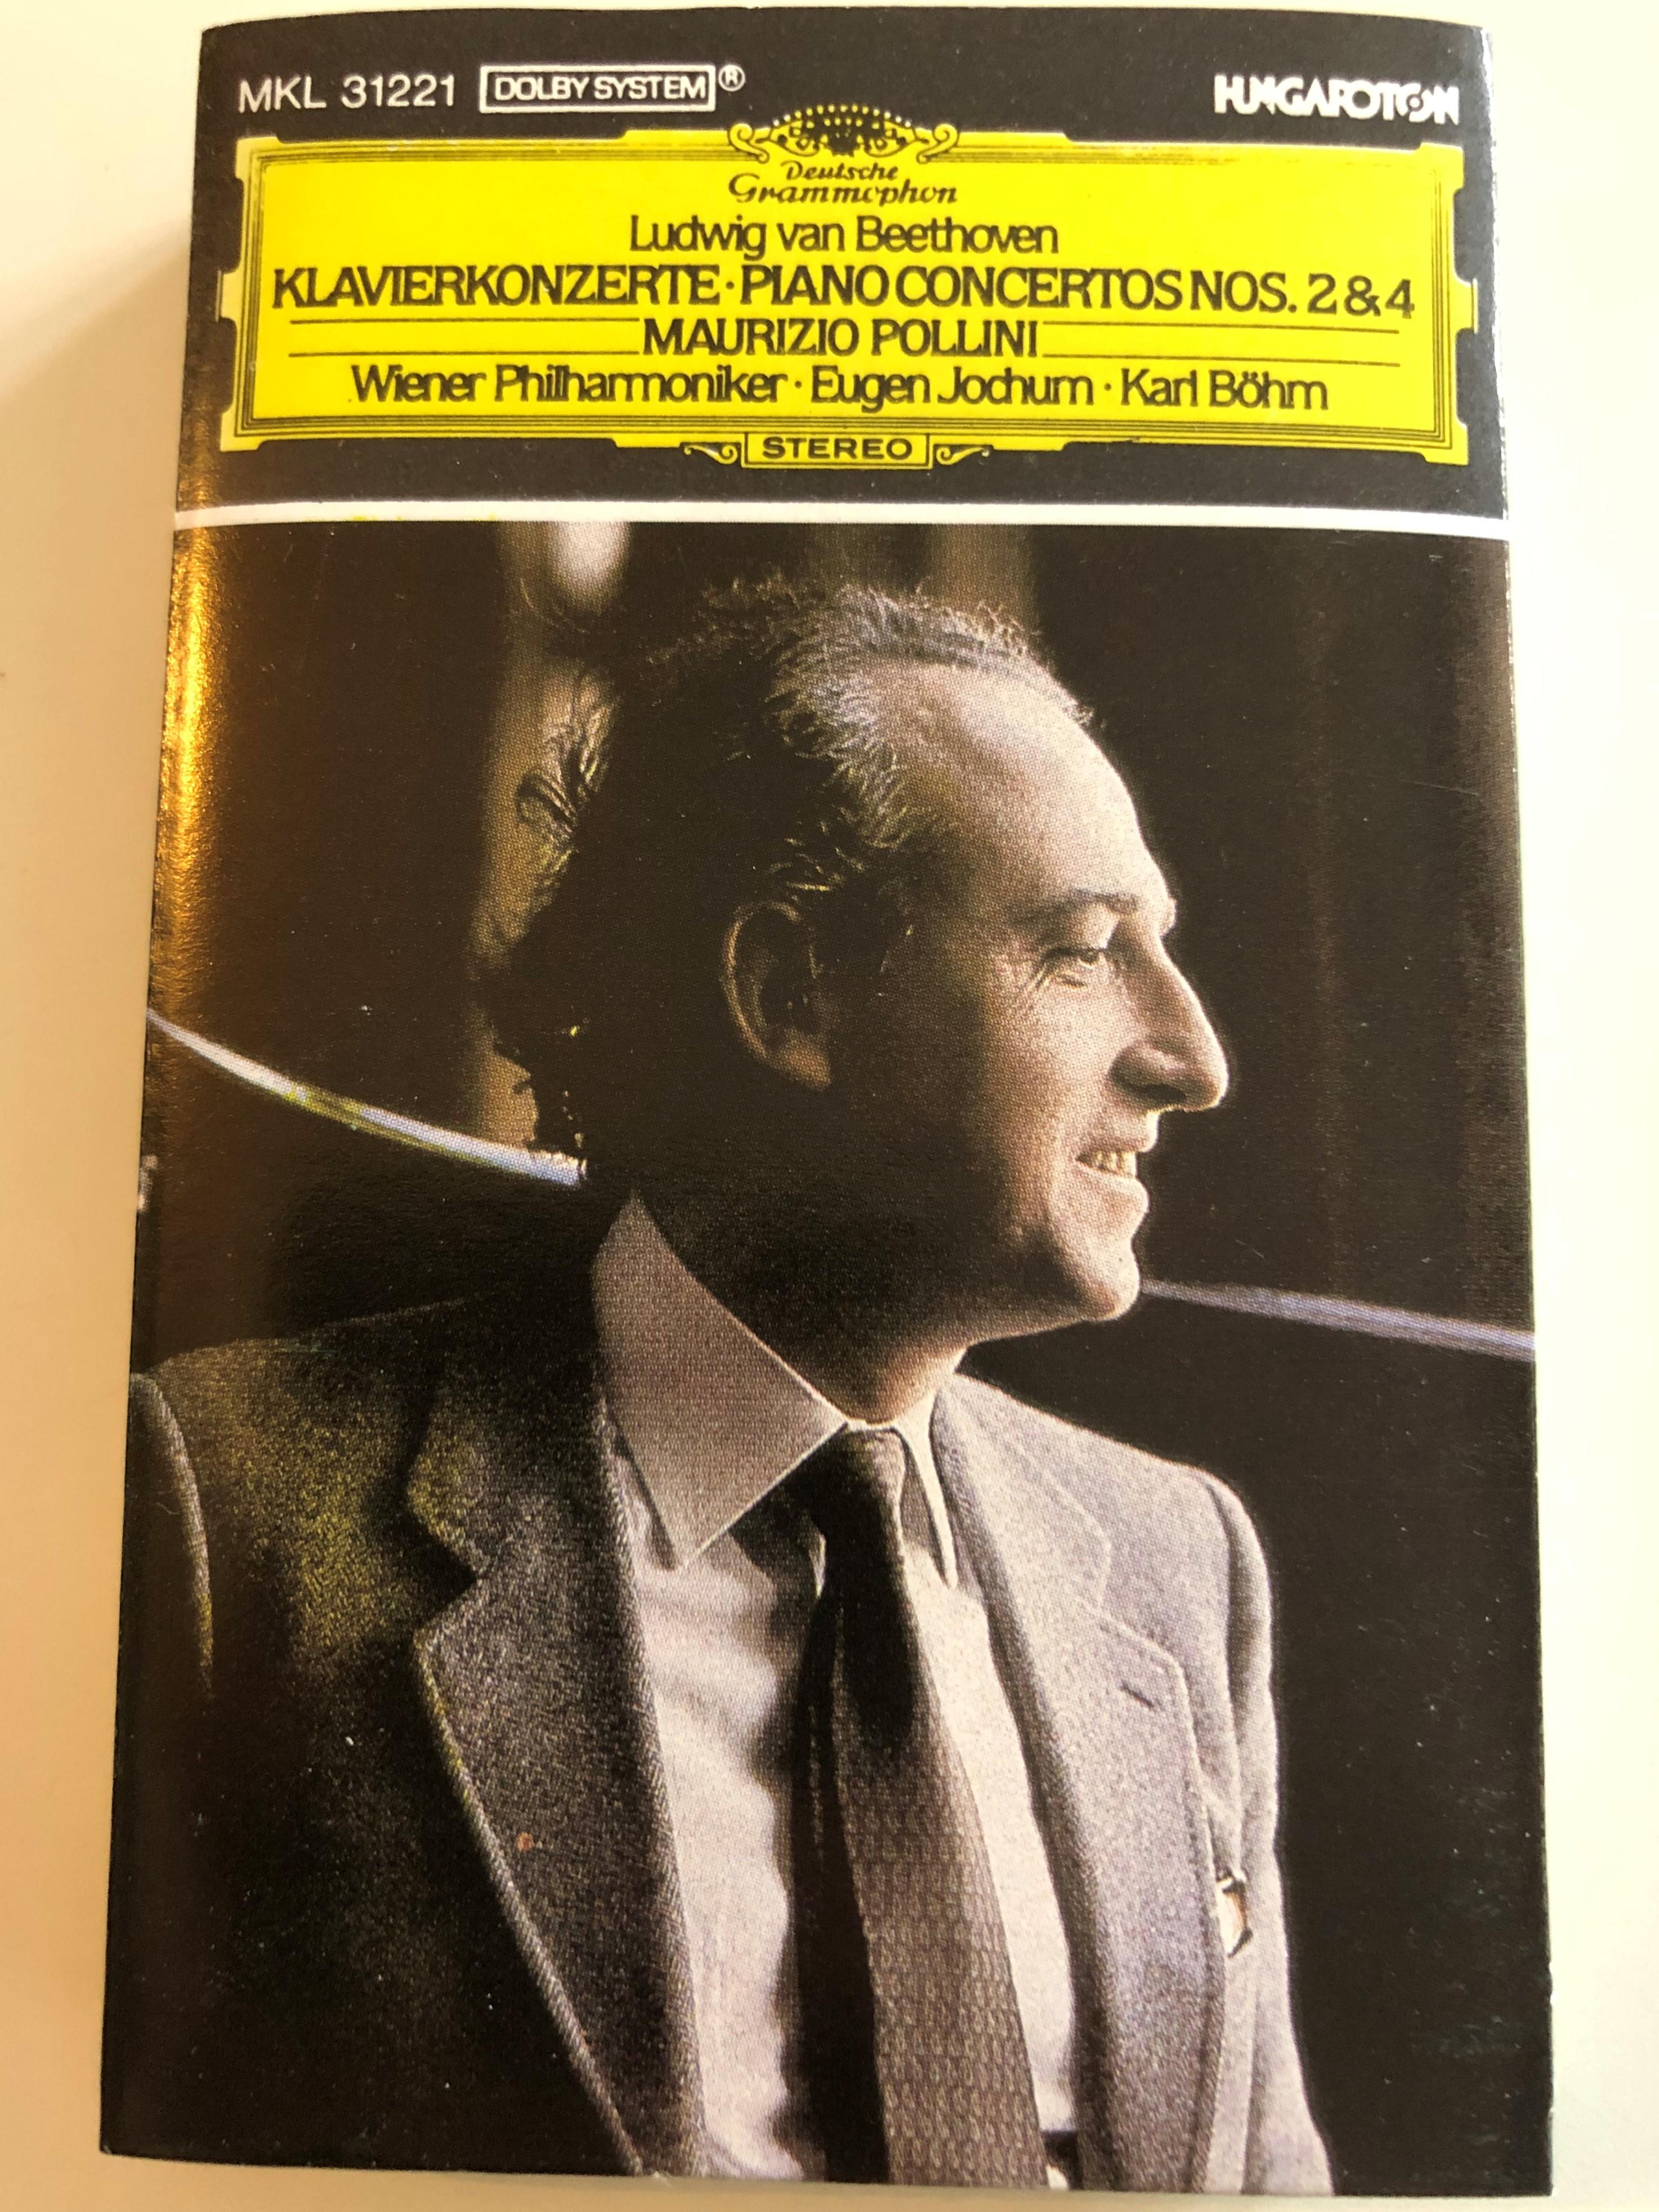 ludwig-van-beethoven-klavierkonzerte-piano-concertos-nos.-2-4-maurizio-pollini-wiener-philharmoniker-conducted-eugen-jochum-karl-b-hm-deutsche-grammophon-cassette-stereo-mkl-31221-1-.jpg